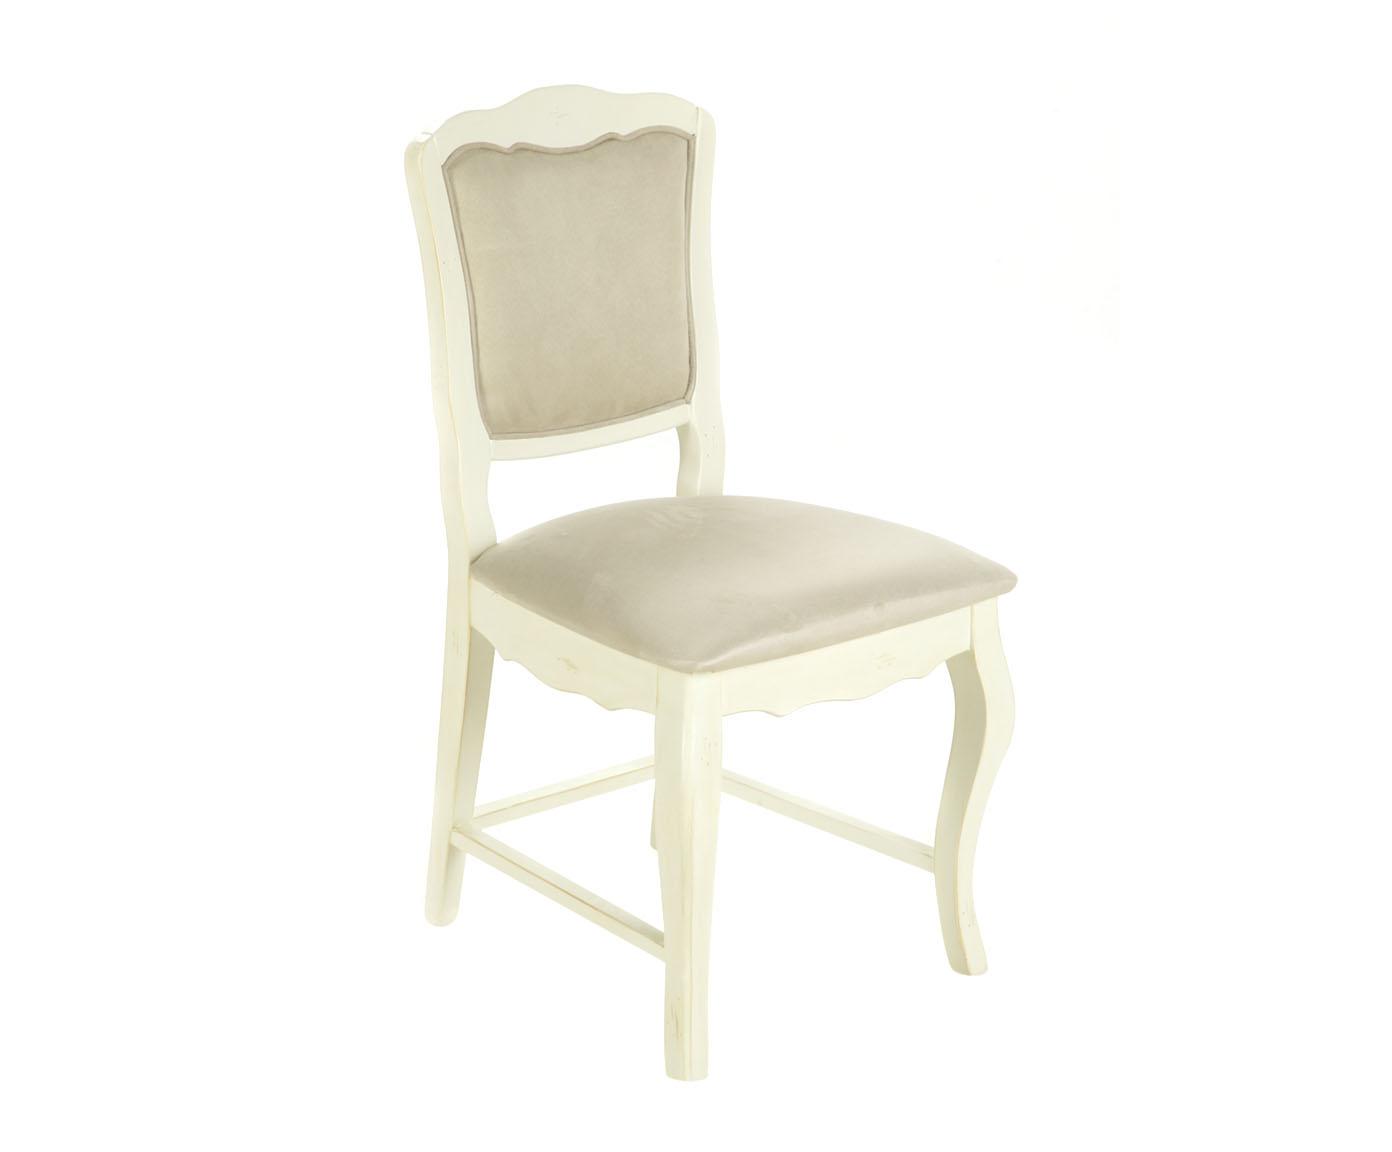 СтулОбеденные стулья<br><br><br>Material: Бук<br>Width см: 50<br>Depth см: 46<br>Height см: 91